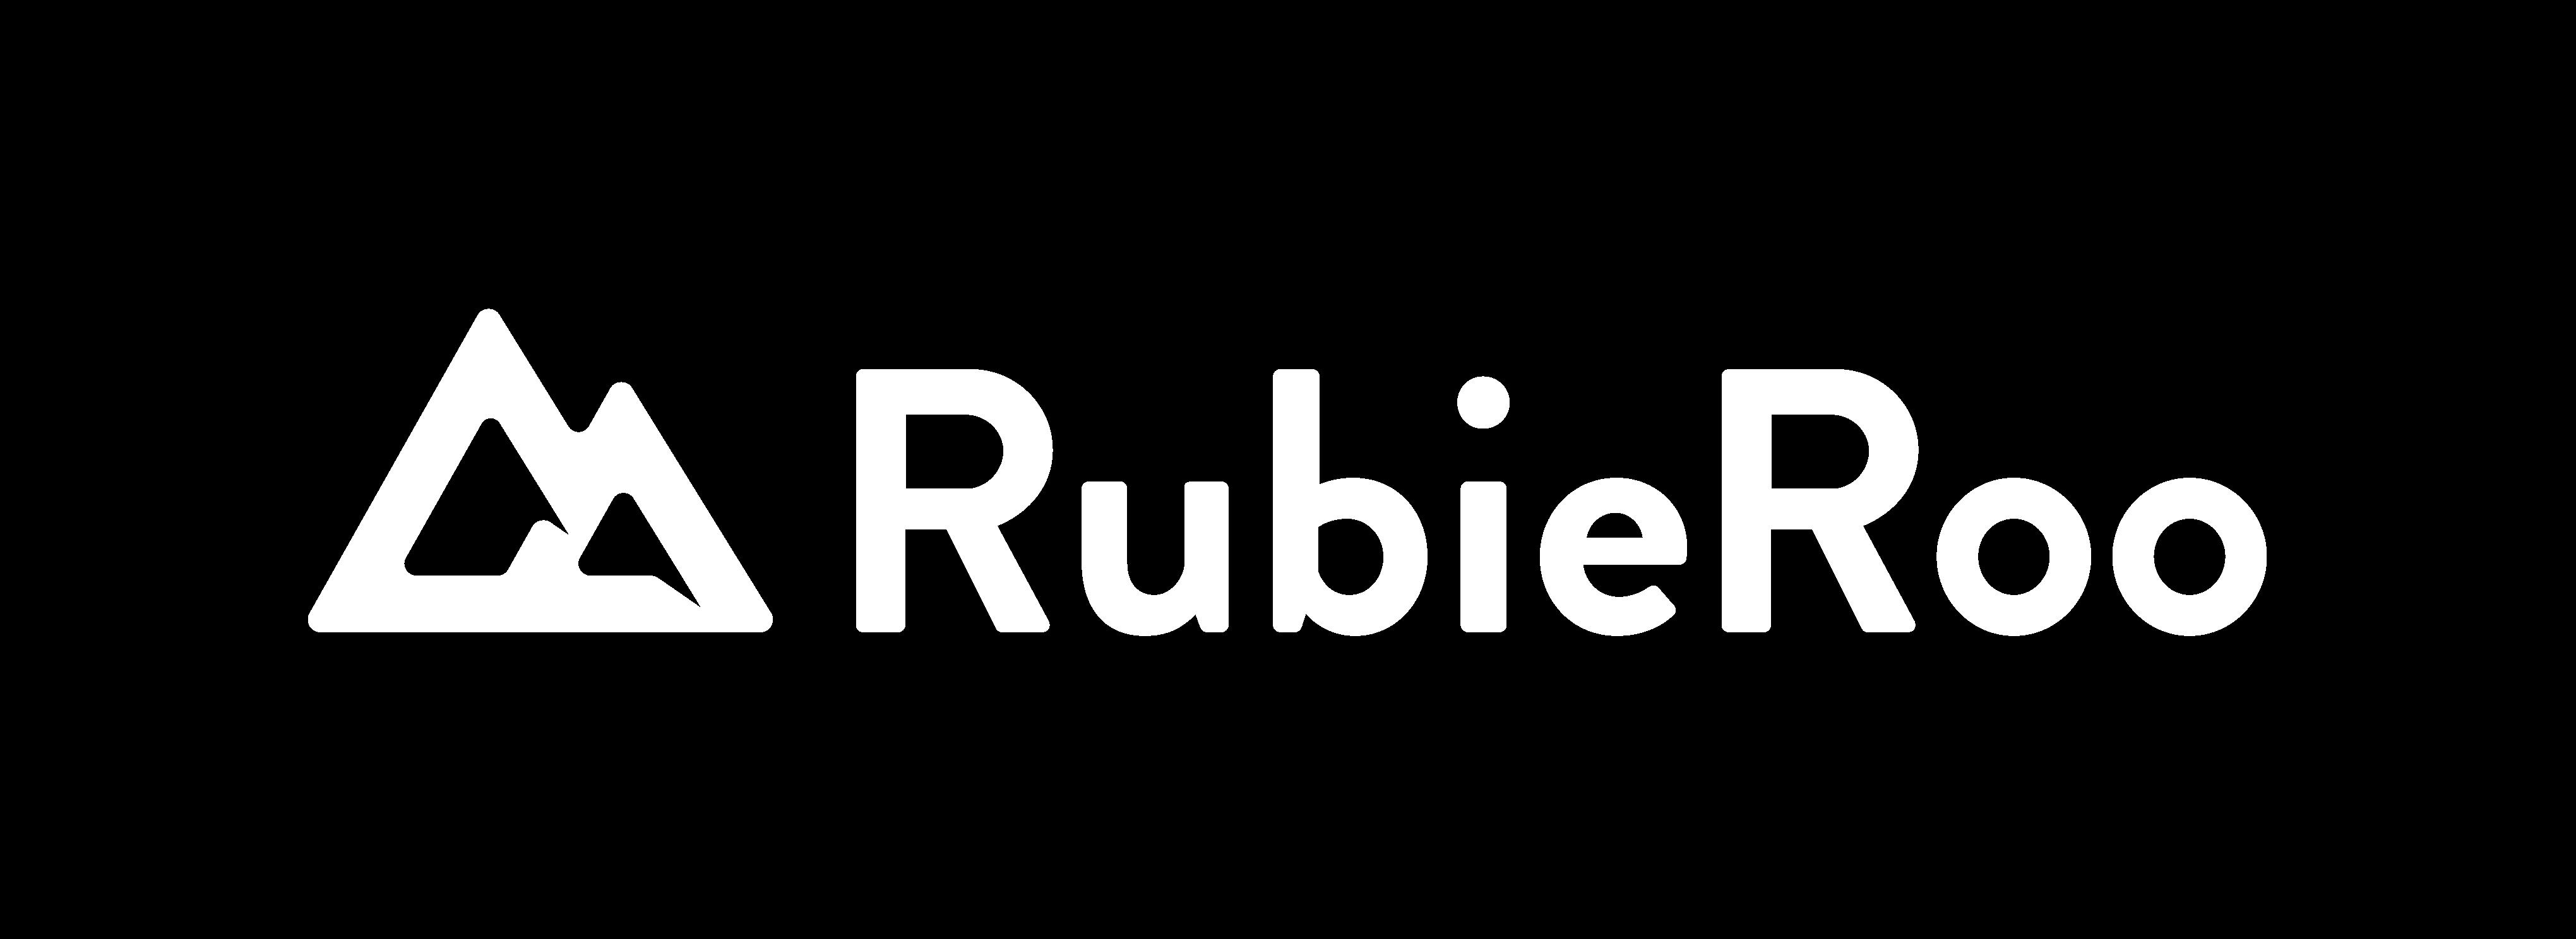 Rubieroo white logo